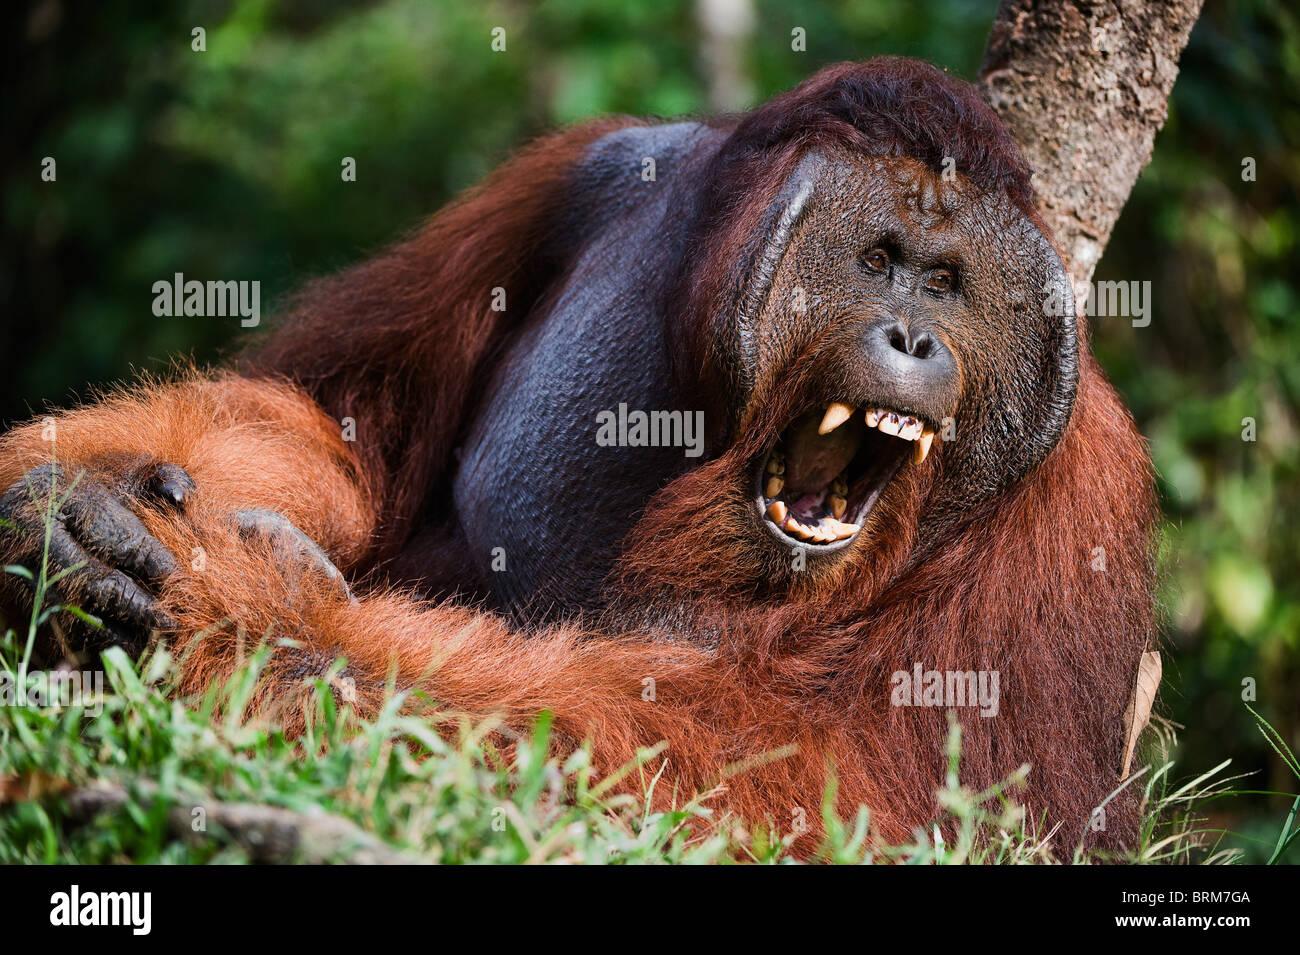 Sbadigliare Orangutan Immagini Stock